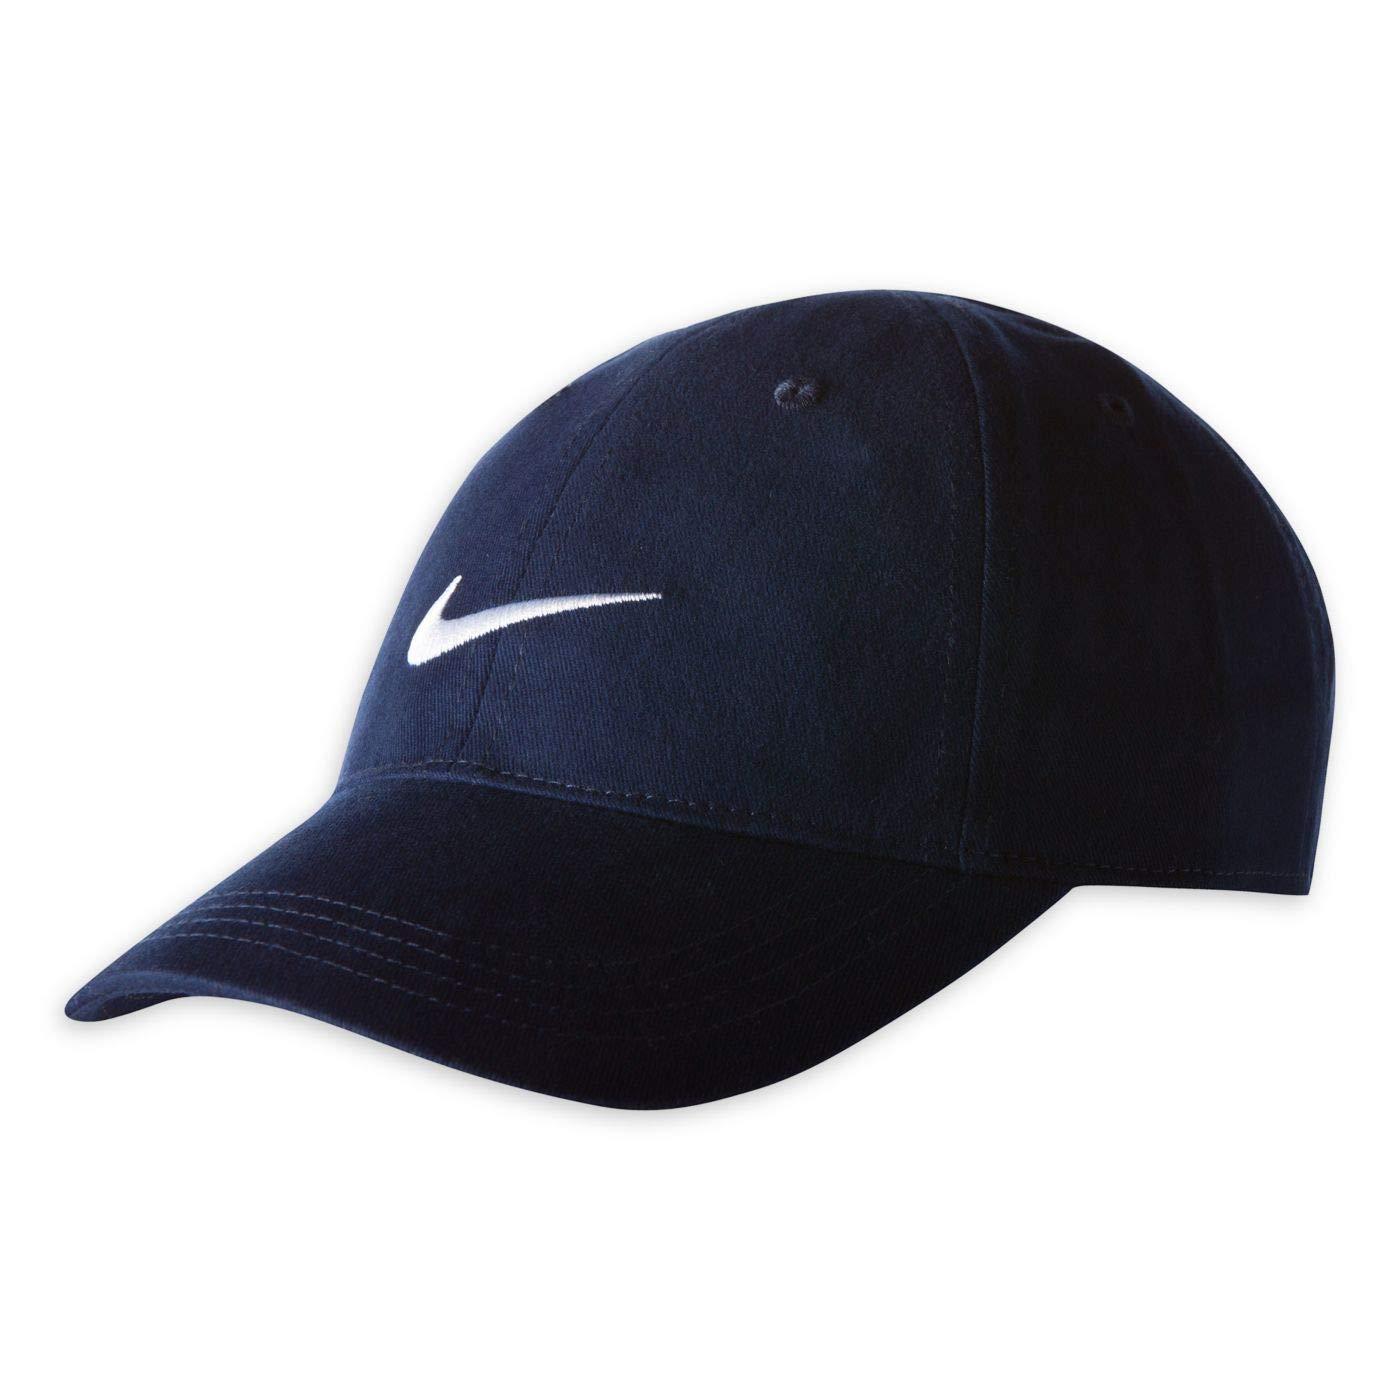 Solid Swoosh Cotton Baseball Cap